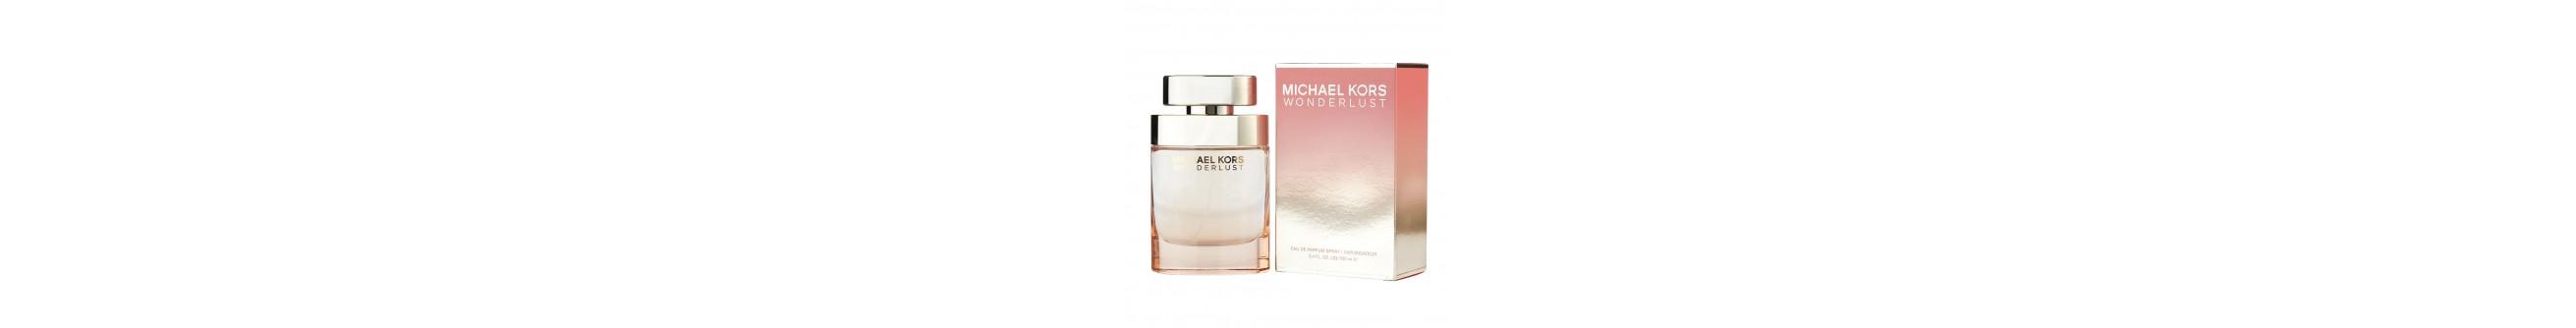 Wonderlust - Michael Kors (άρωμα τύπου)